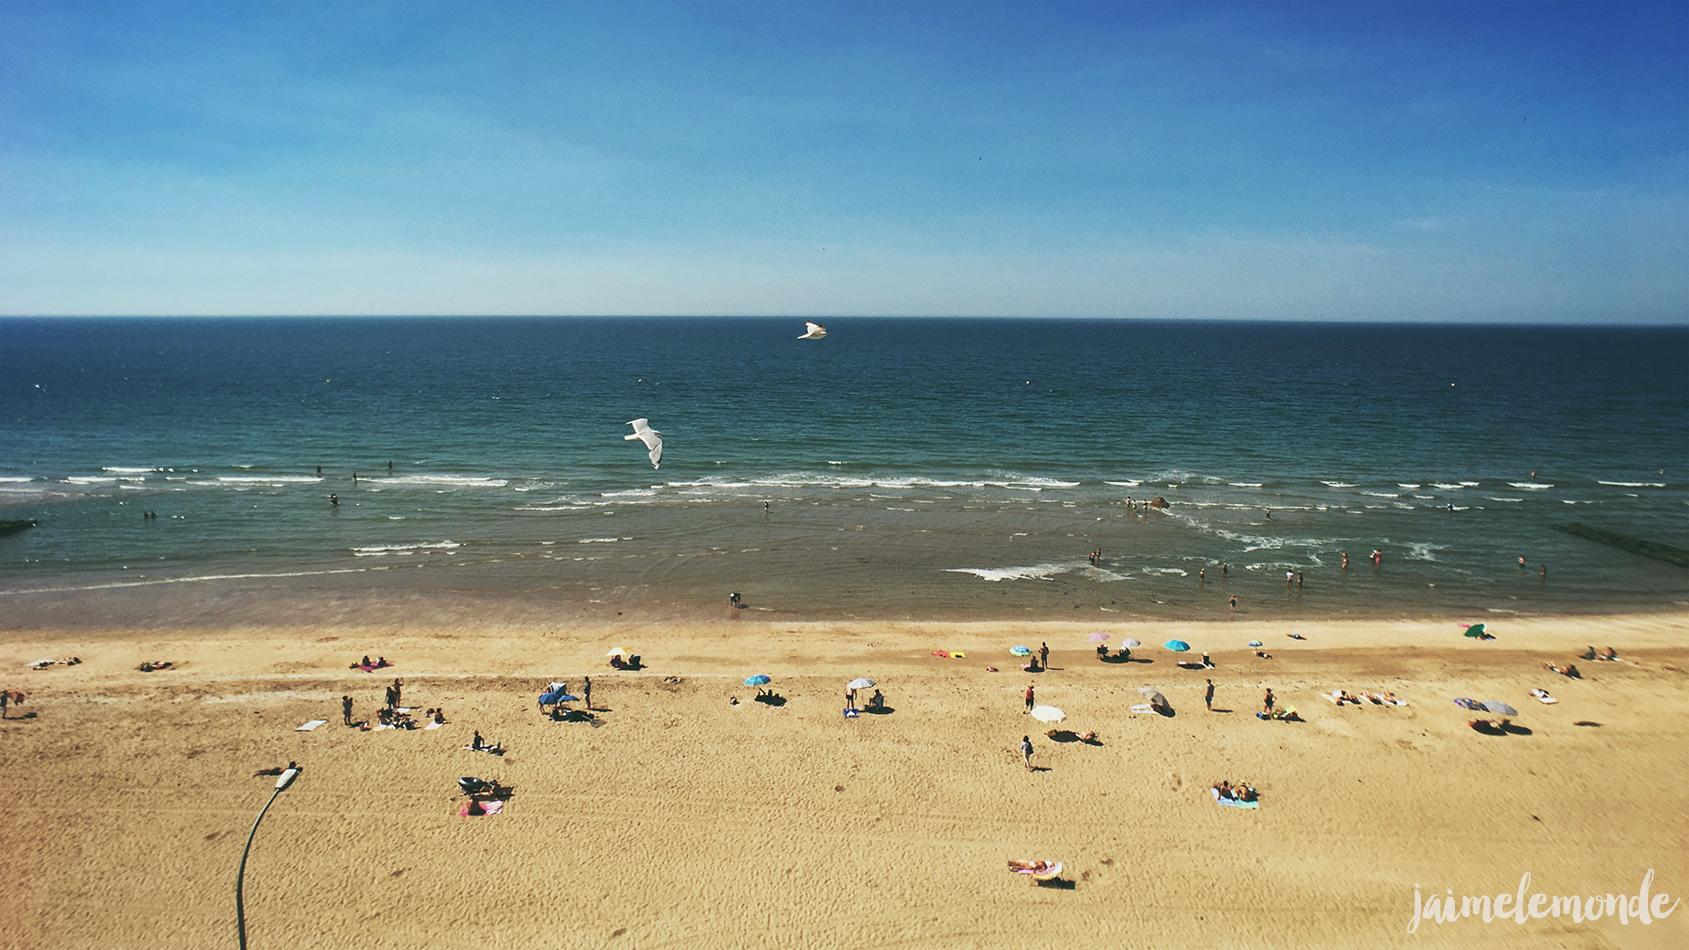 Pixter - Grand angle pro - Blonville sur mer - ©jaimelemonde (2)